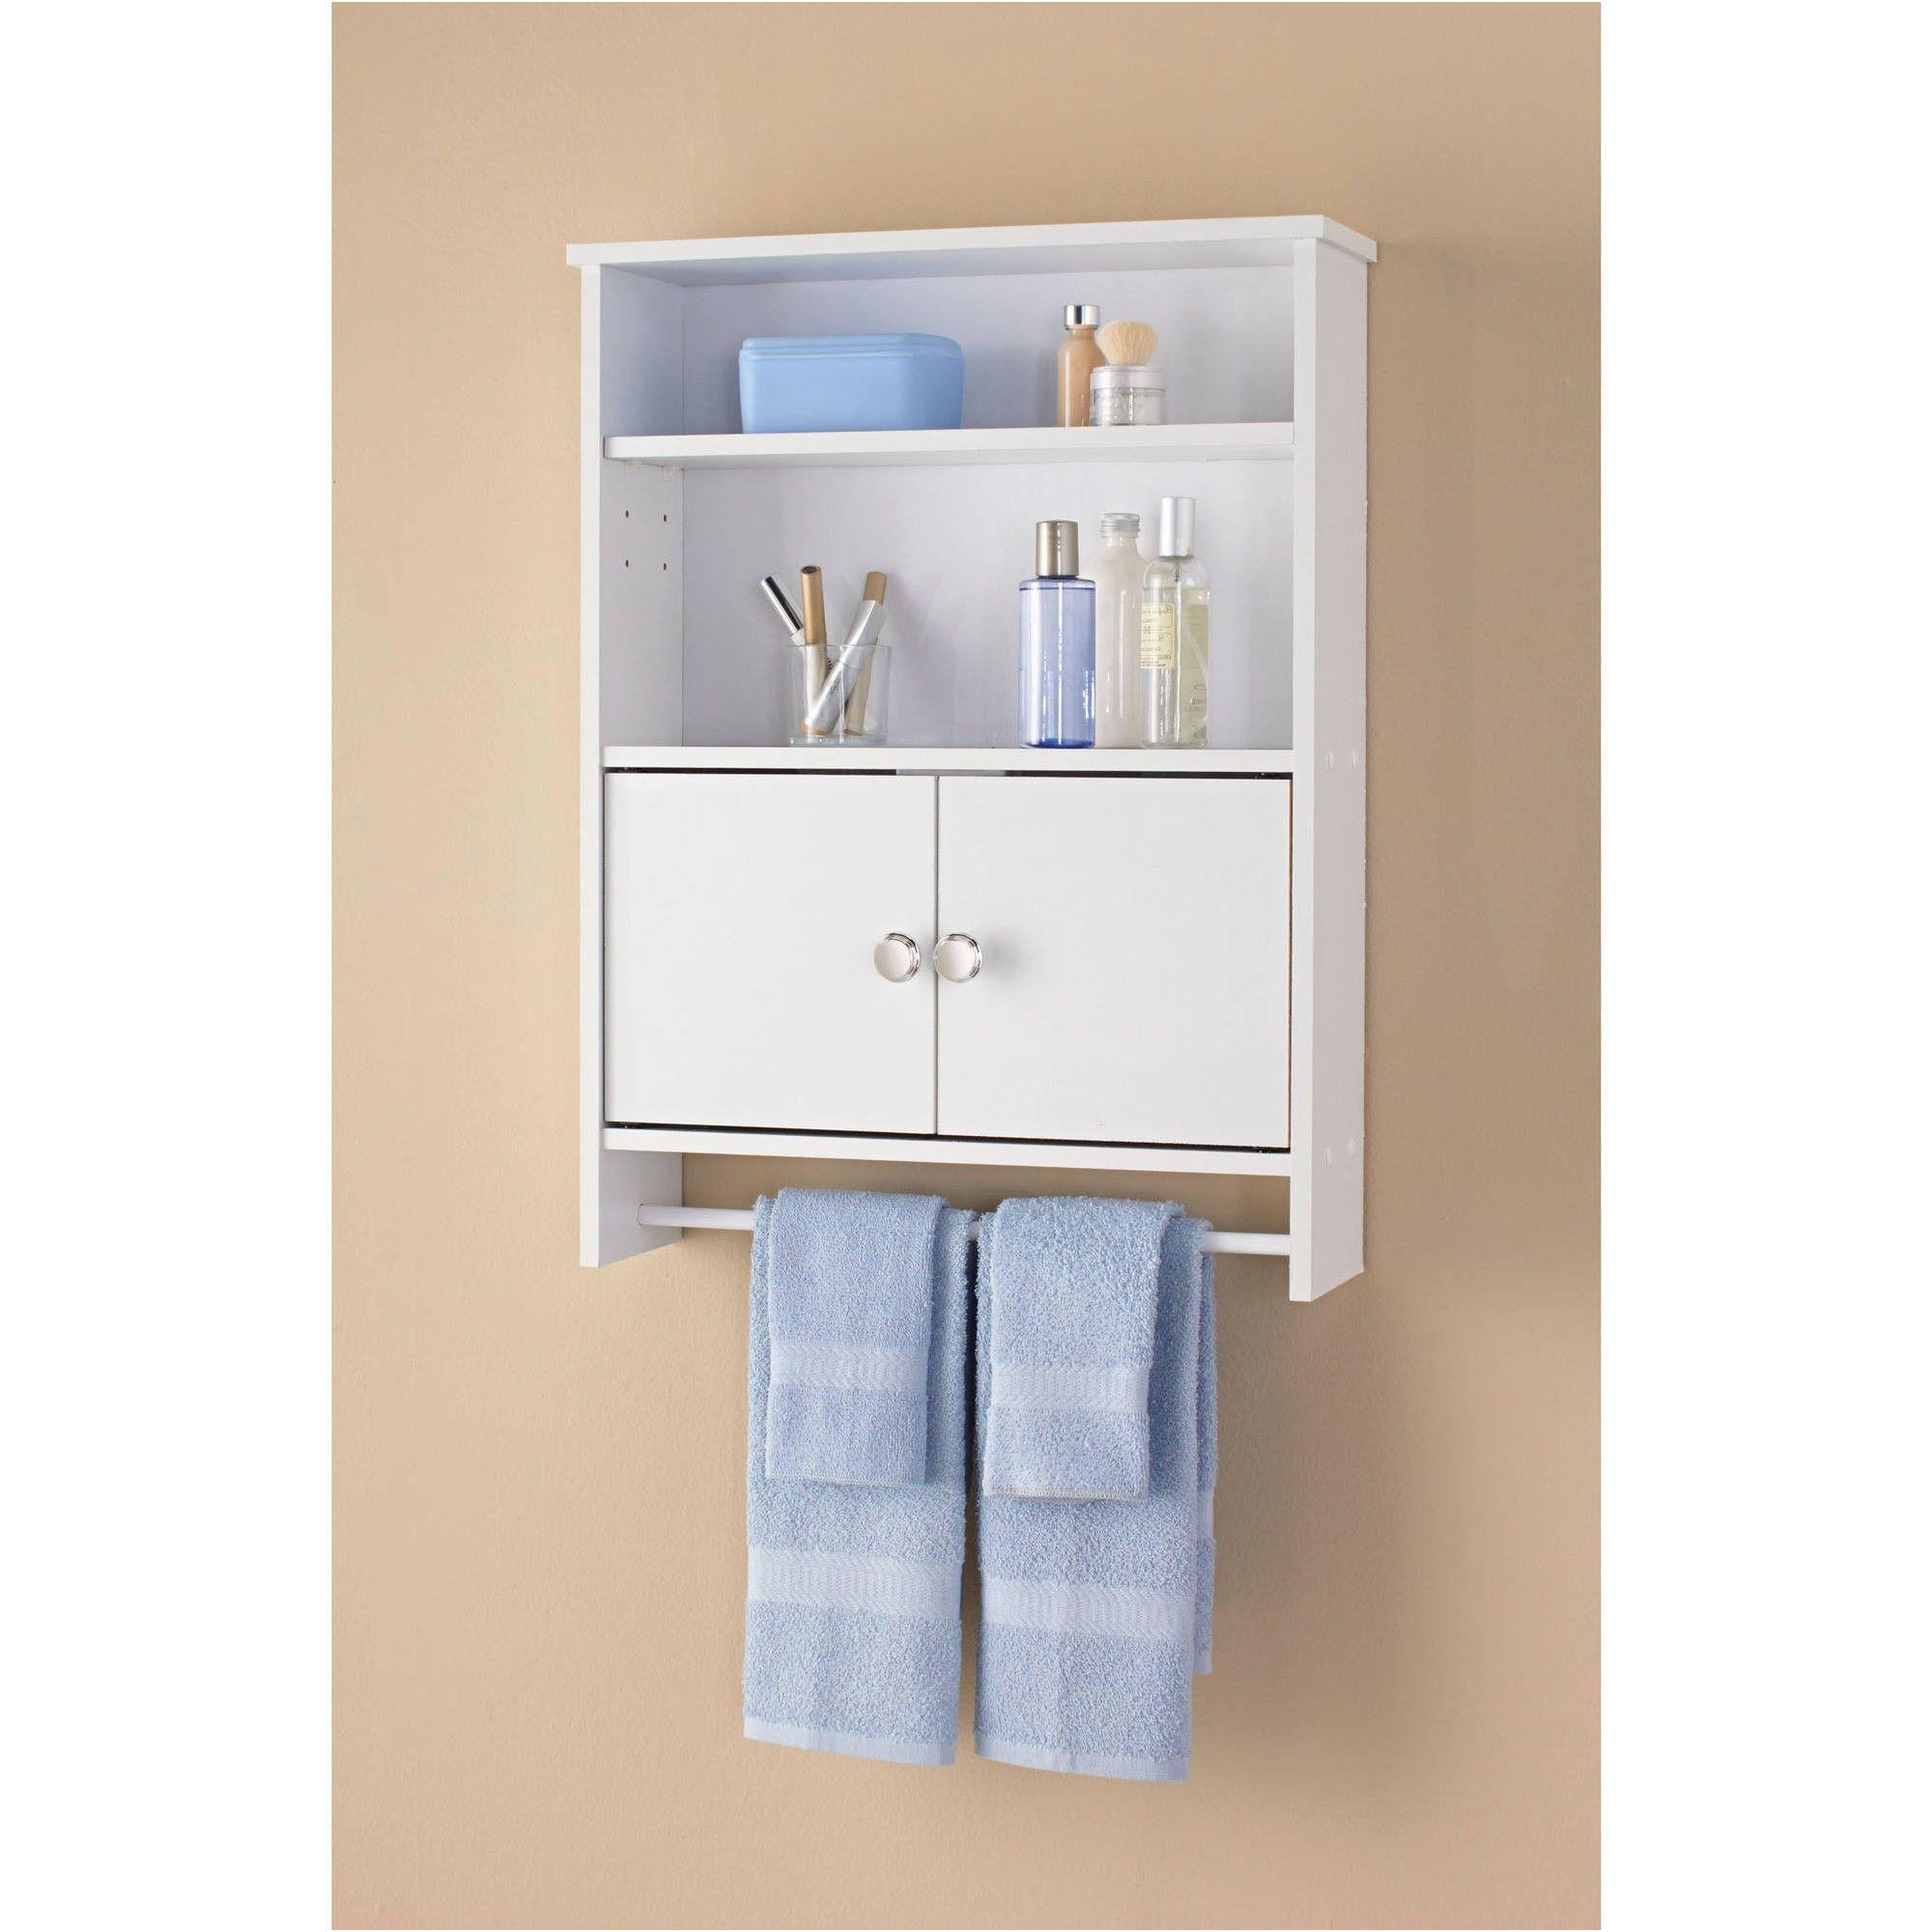 Mainstays 2 Door Wood Wall Cabinet White Walmart From Bathroom